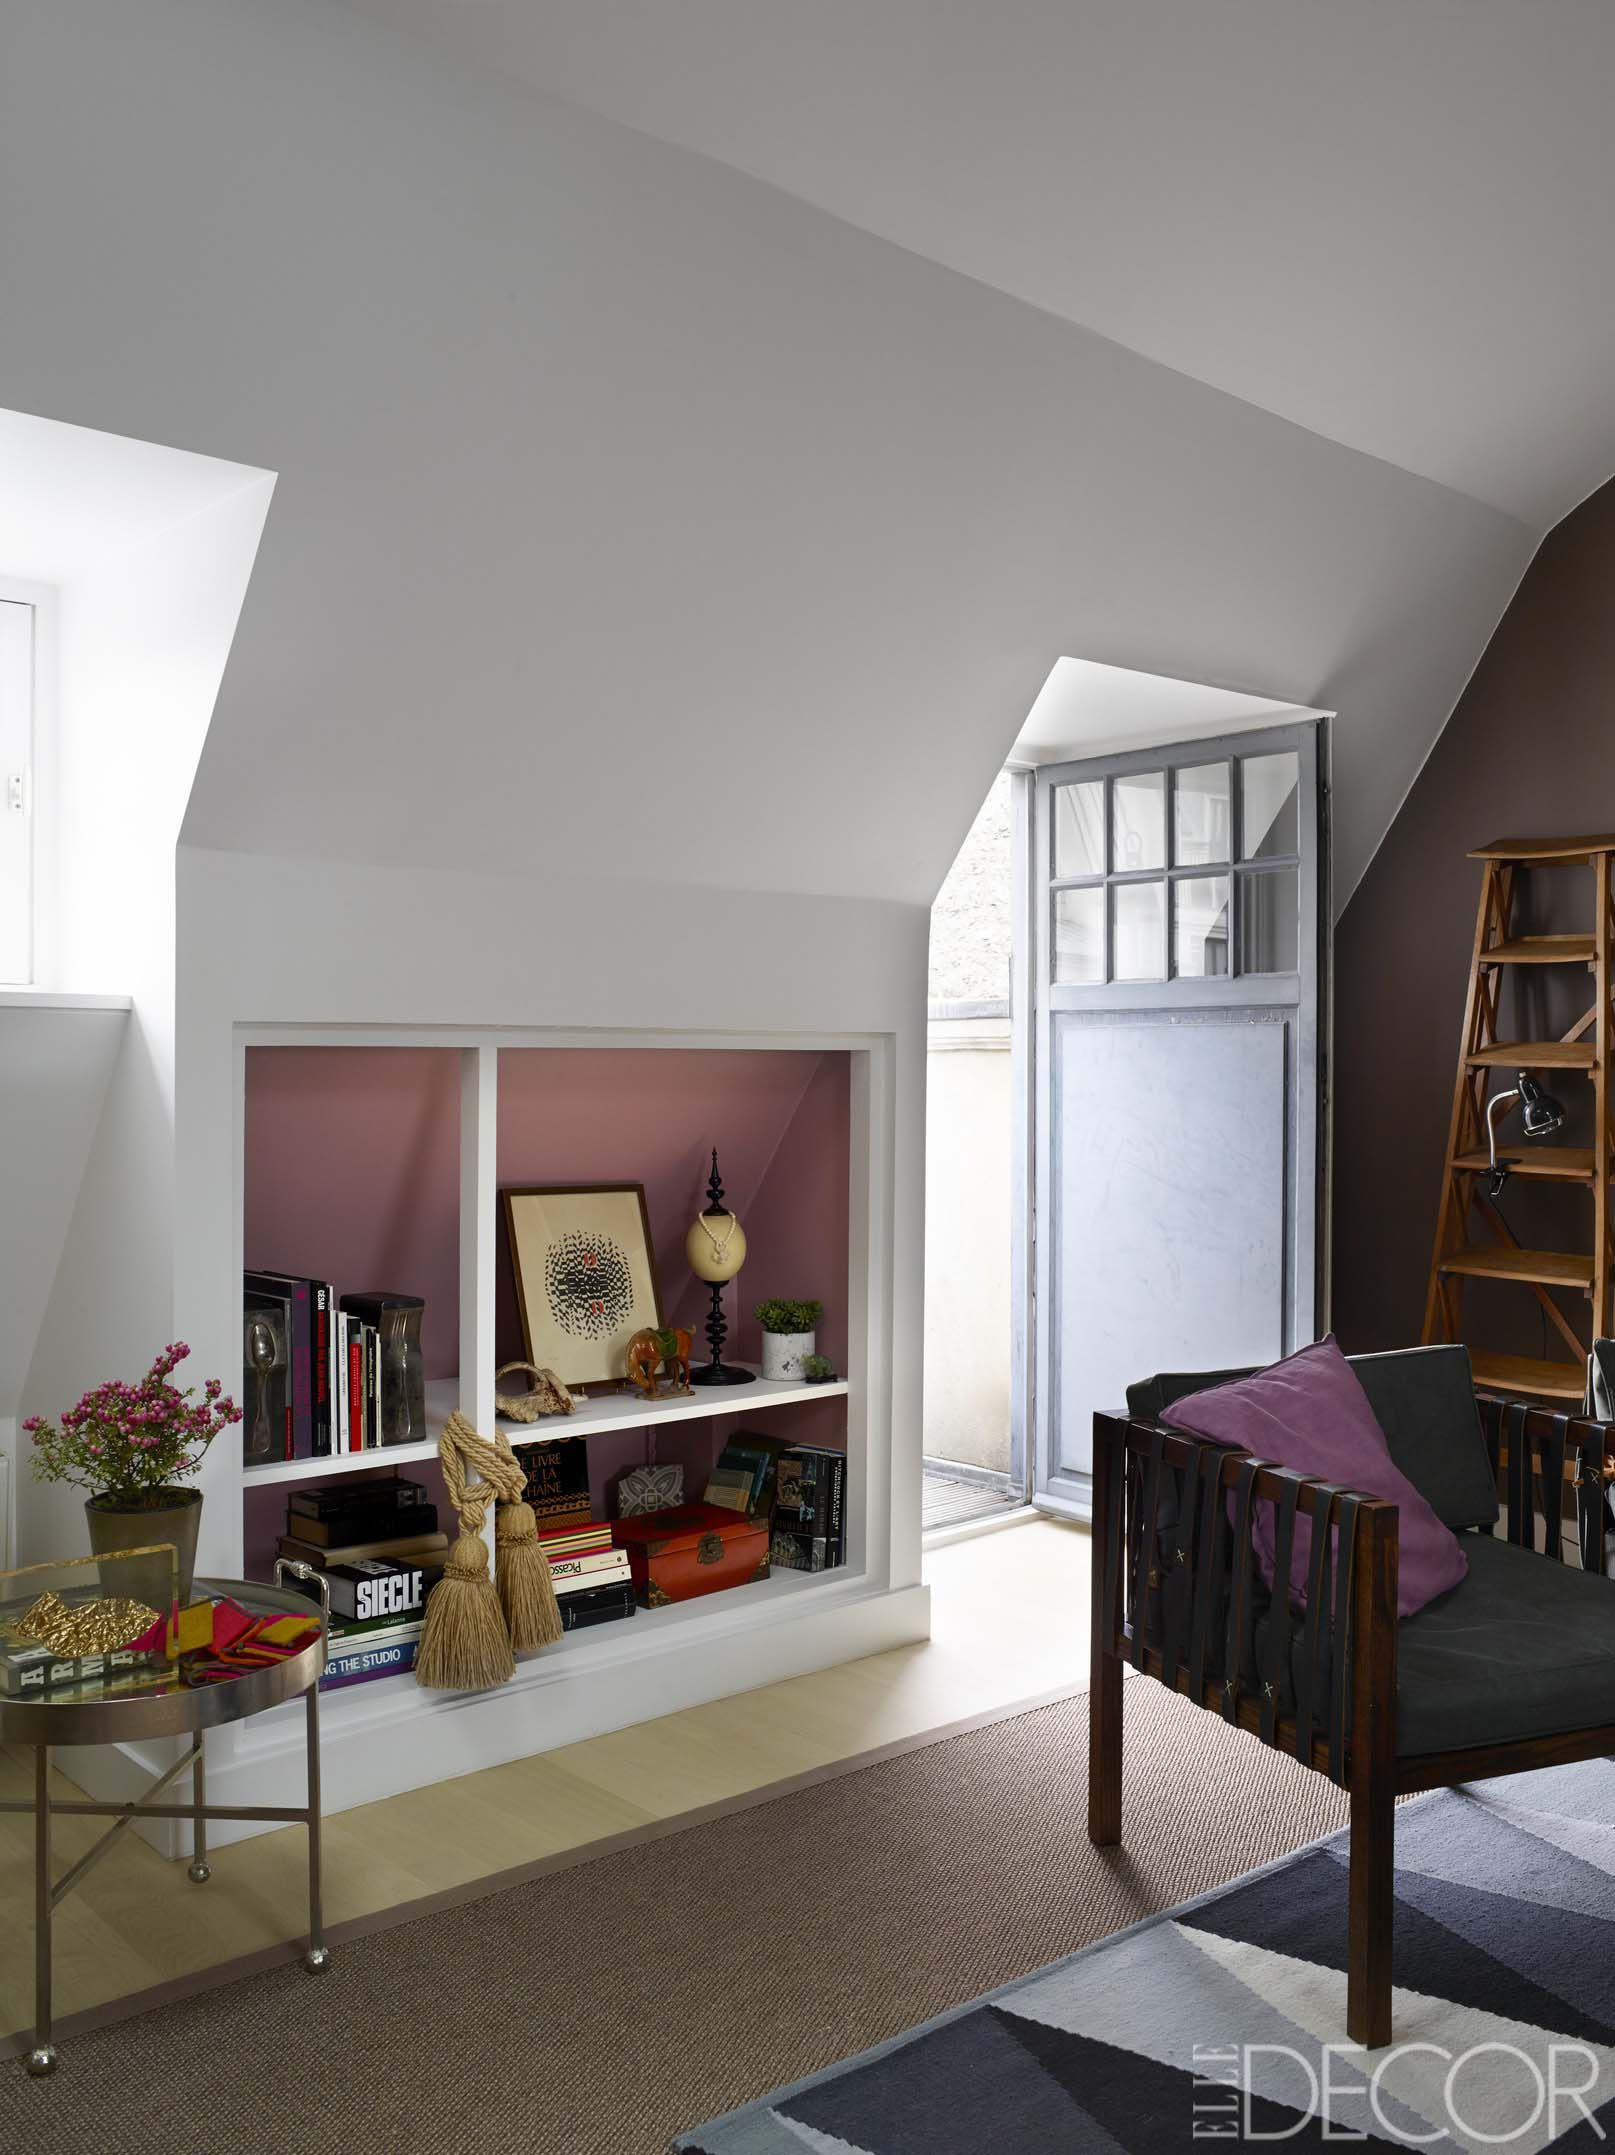 HOUSE TOUR Inside A Bohemian Rooftop Apartment In Paris